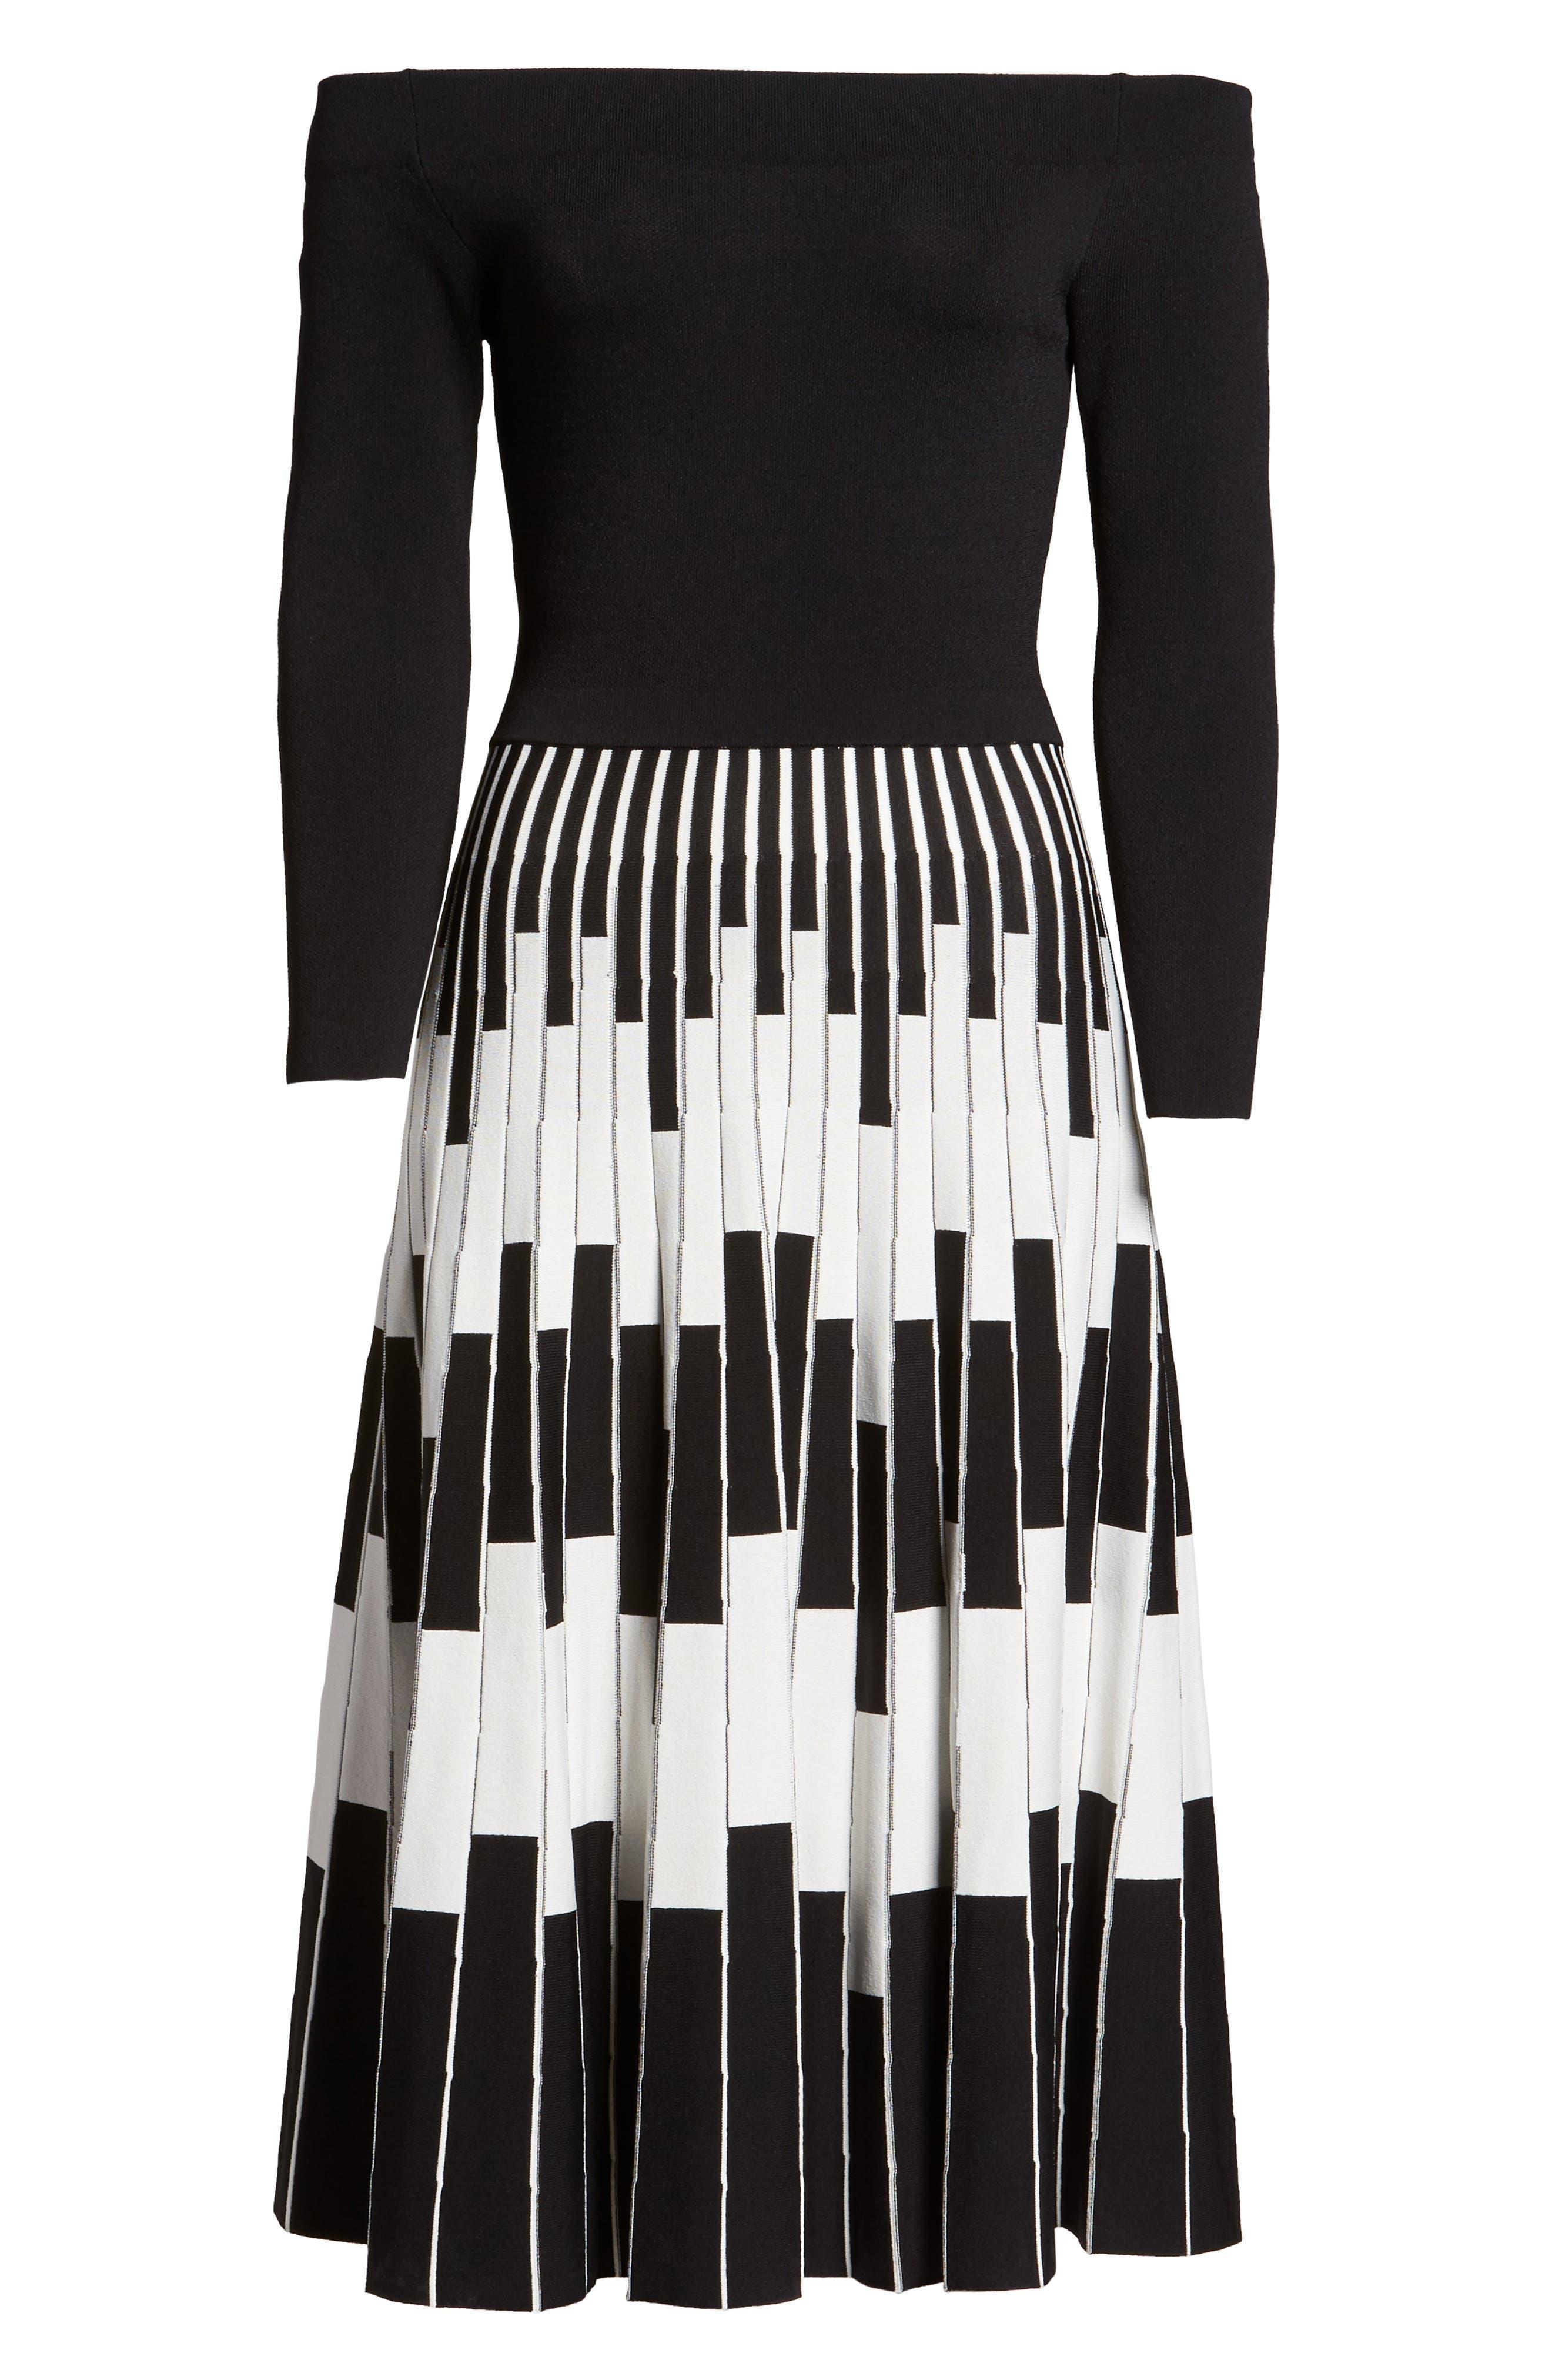 Off the Shoulder Midi Dress,                             Alternate thumbnail 6, color,                             BLACK/ IVORY